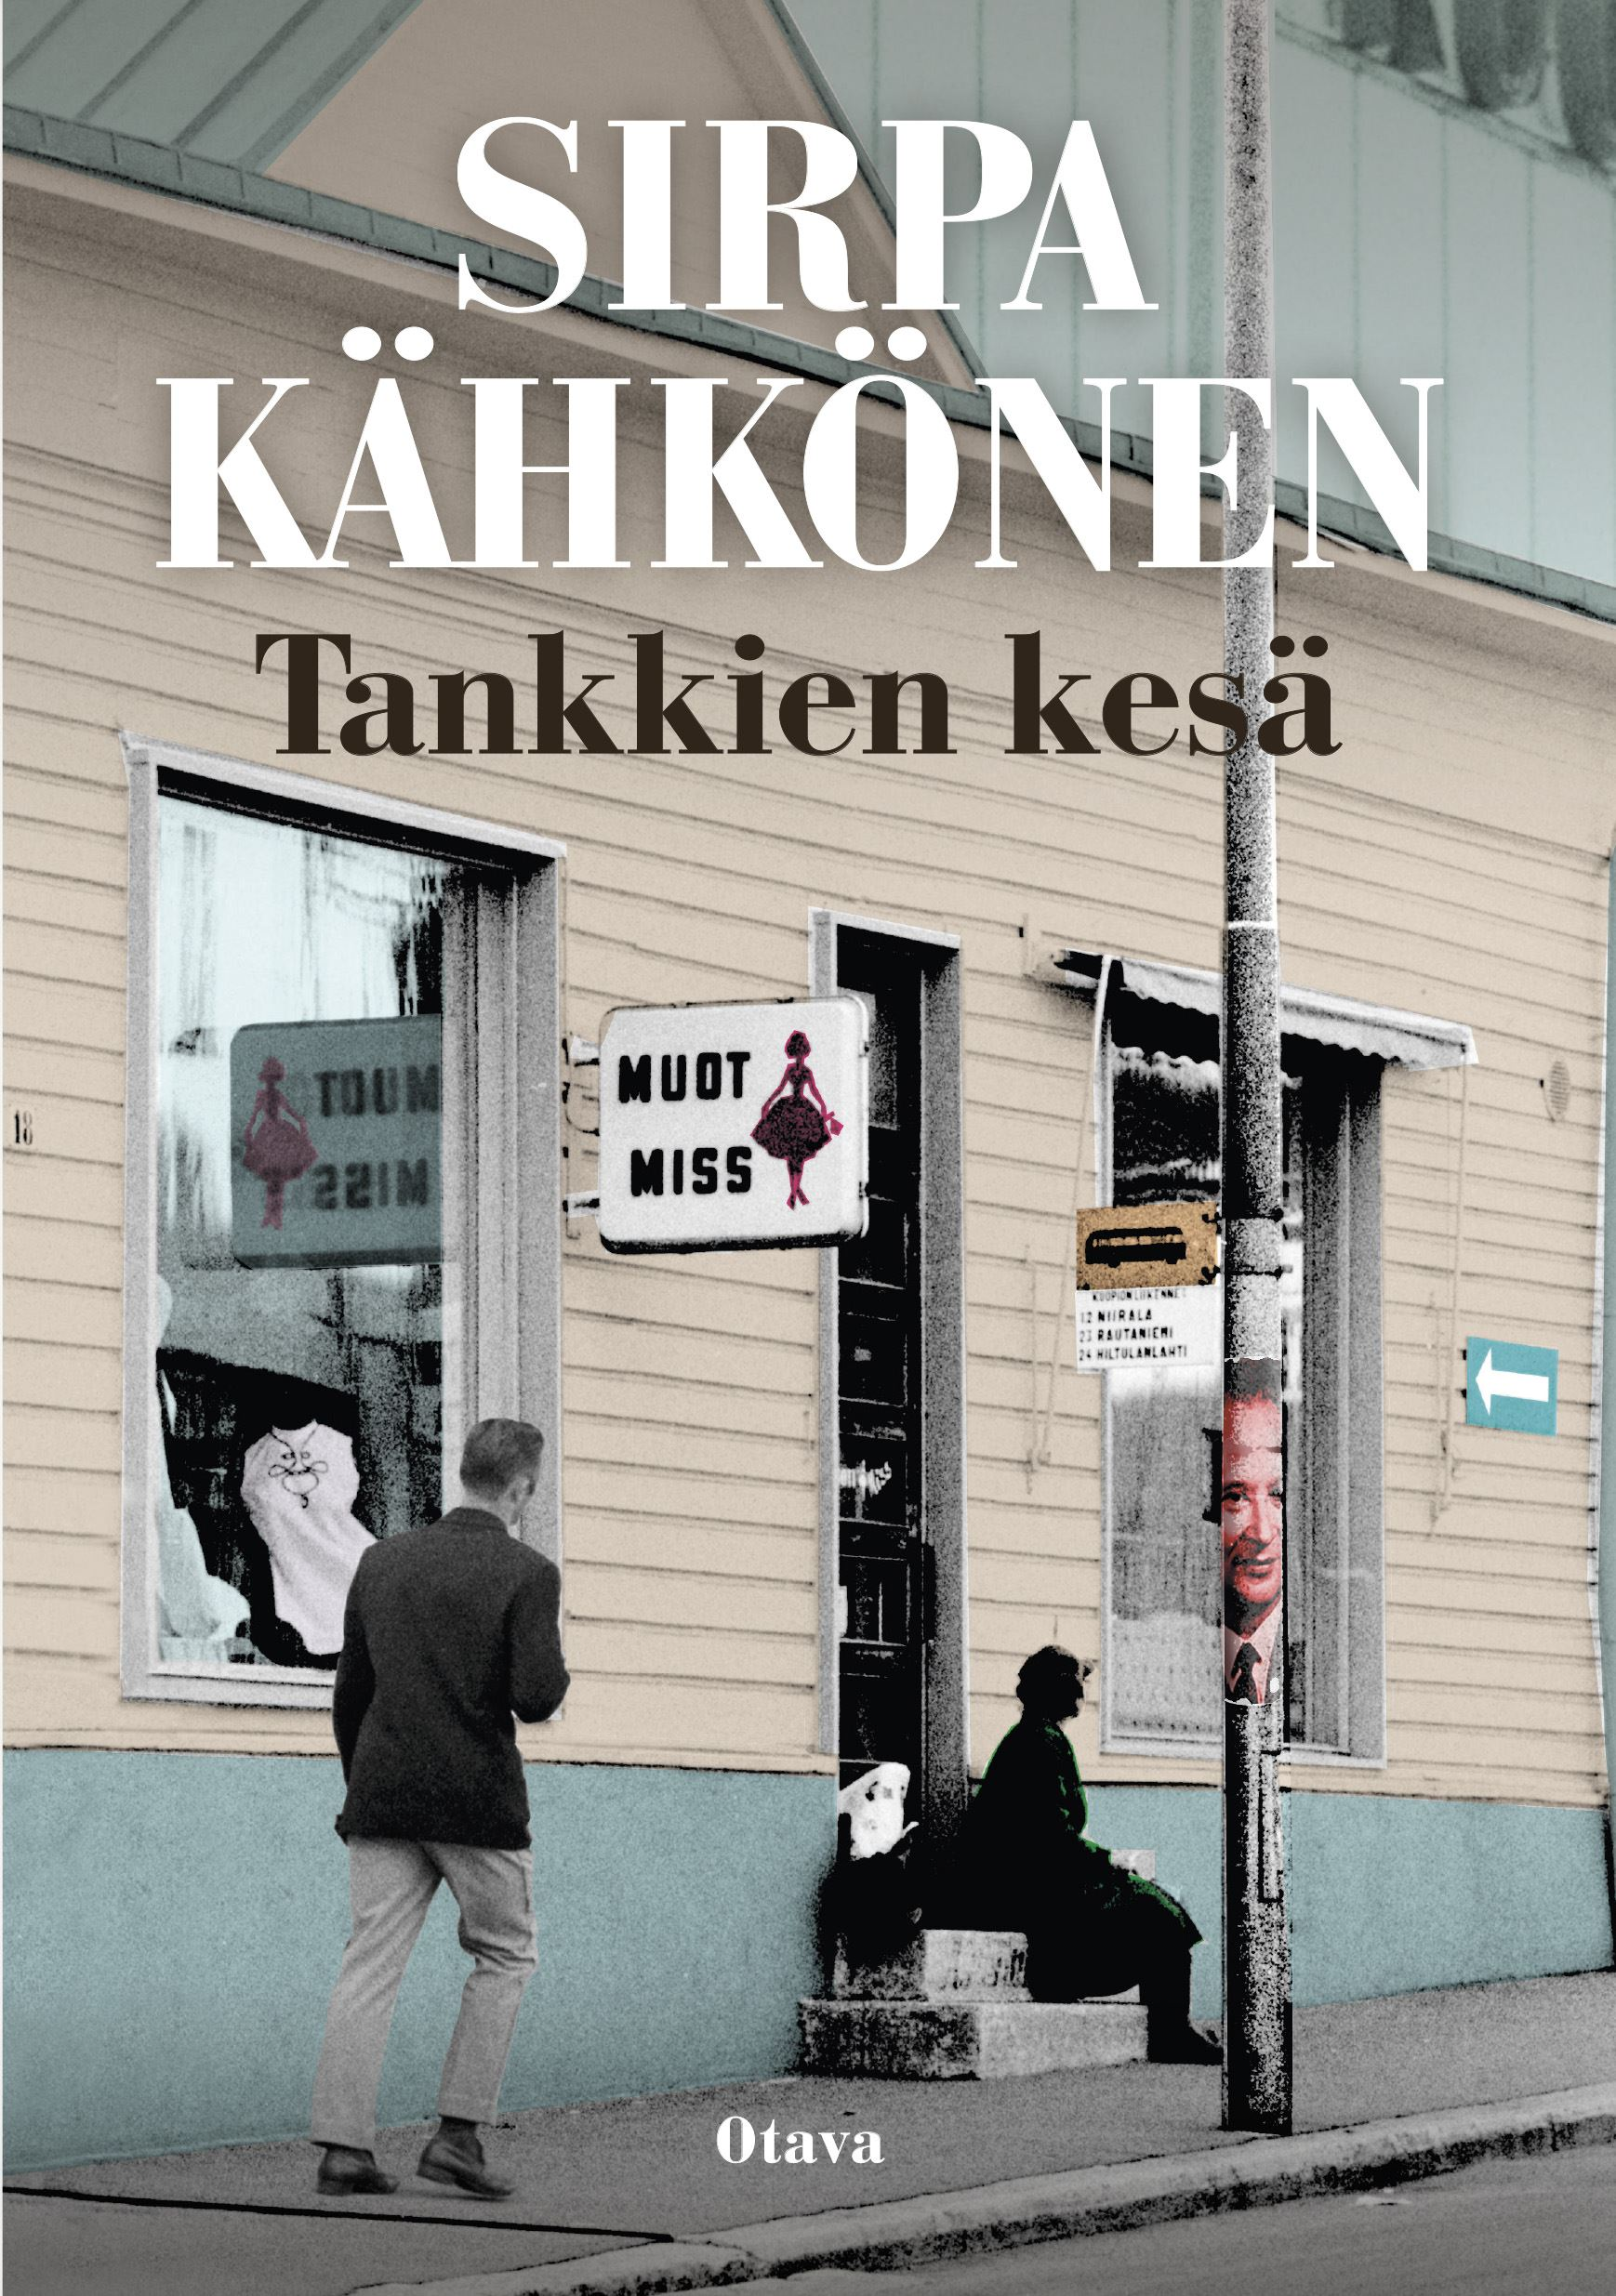 Suomenkielinen lukupiiri / Finskspråkig läsecirkel